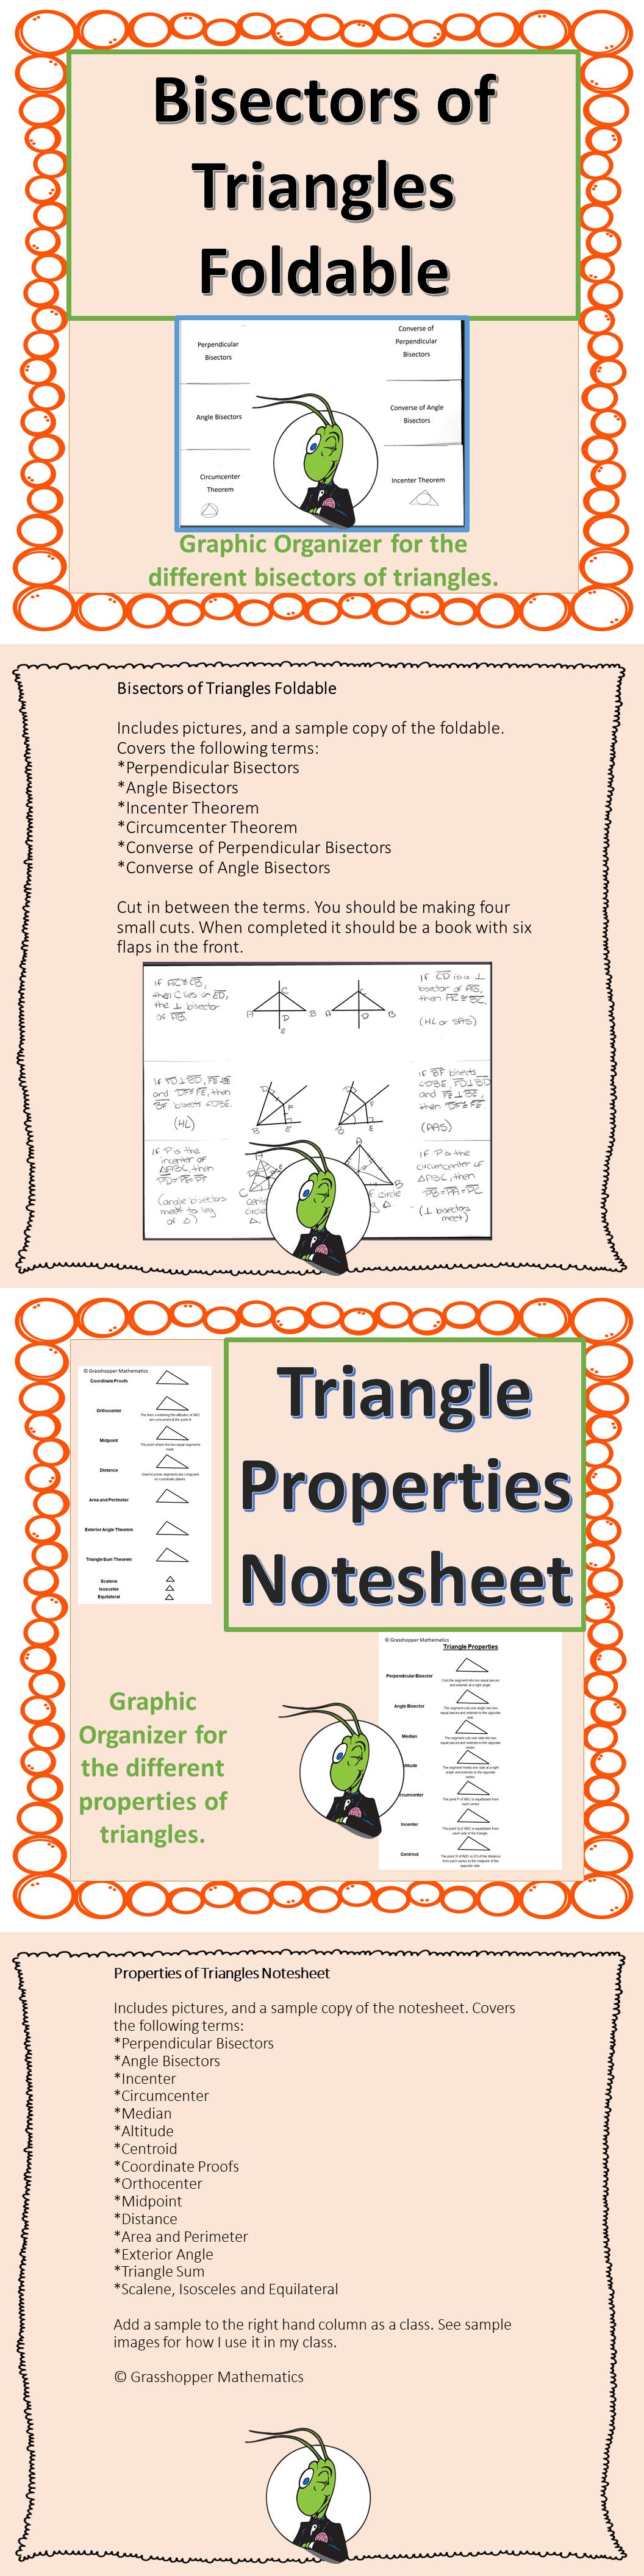 Triangle Properties Notesheet Foldable Graphic Organizer